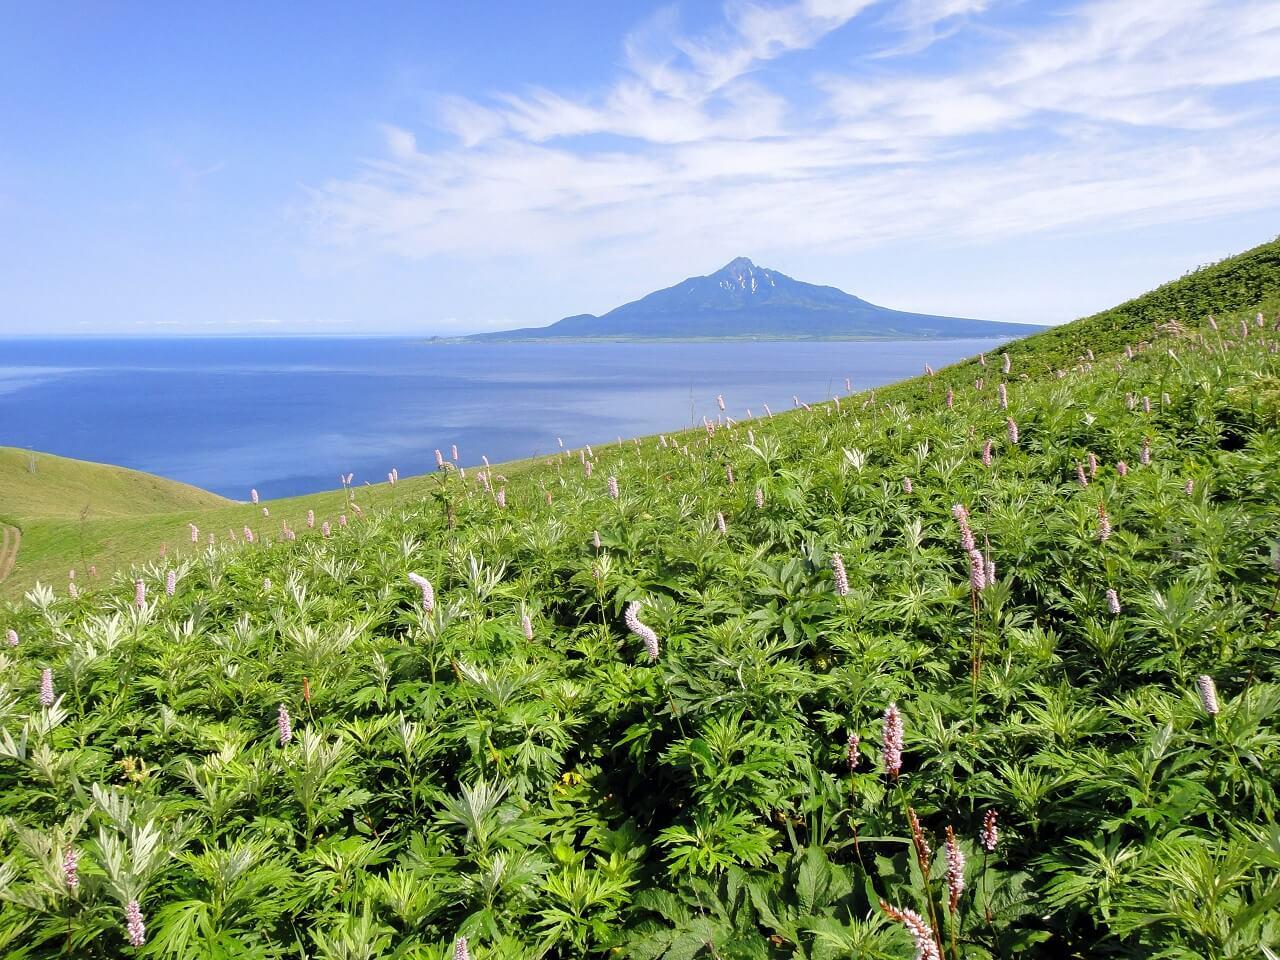 Rebun Island: An Island of Unique Flowers and Alpine Beauty